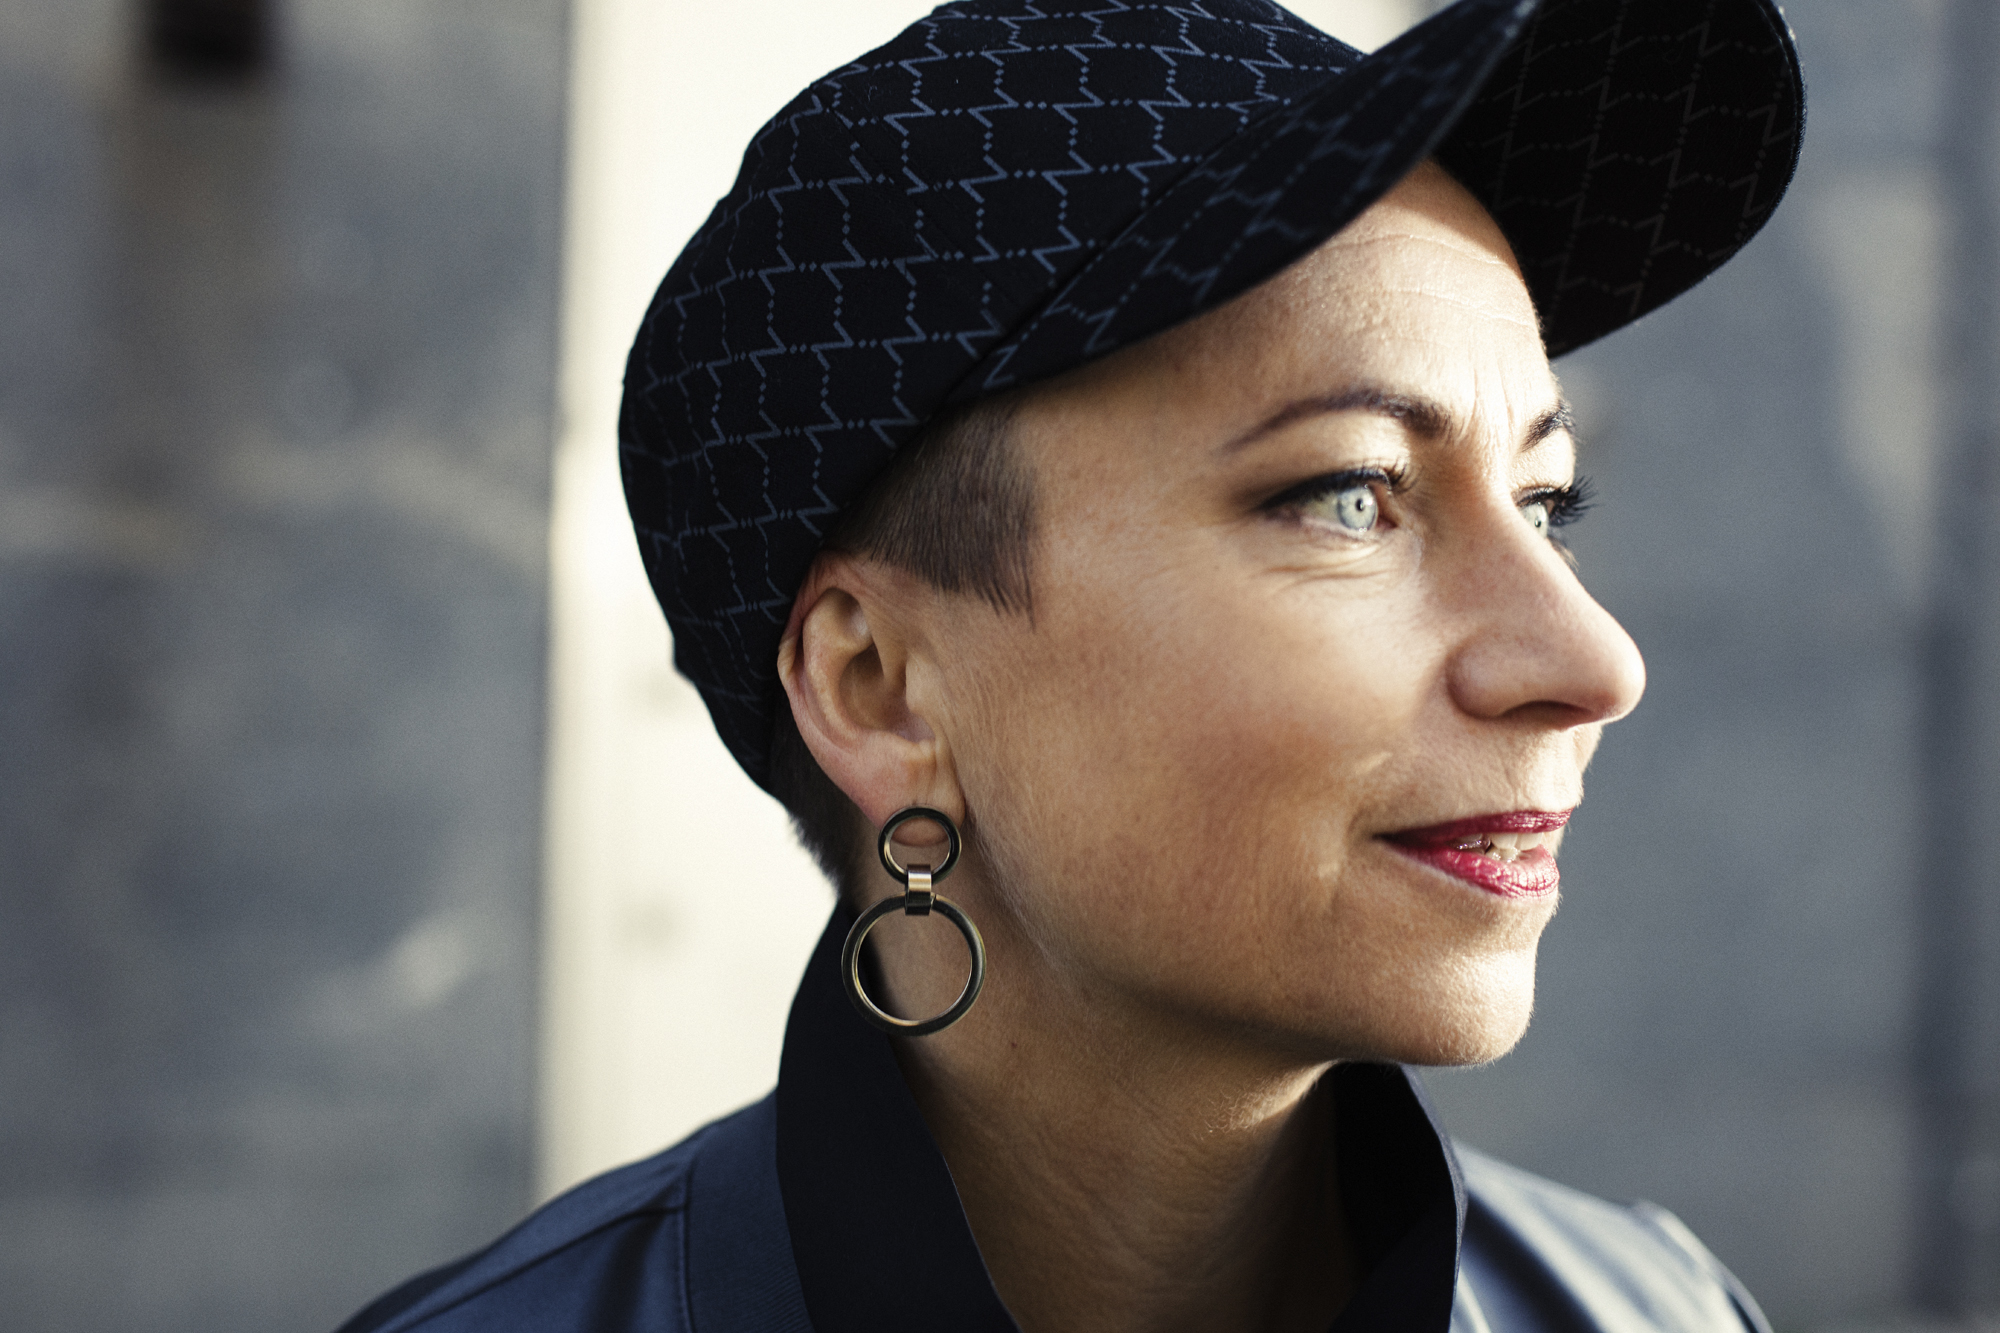 Marika Hedemyr Portrait